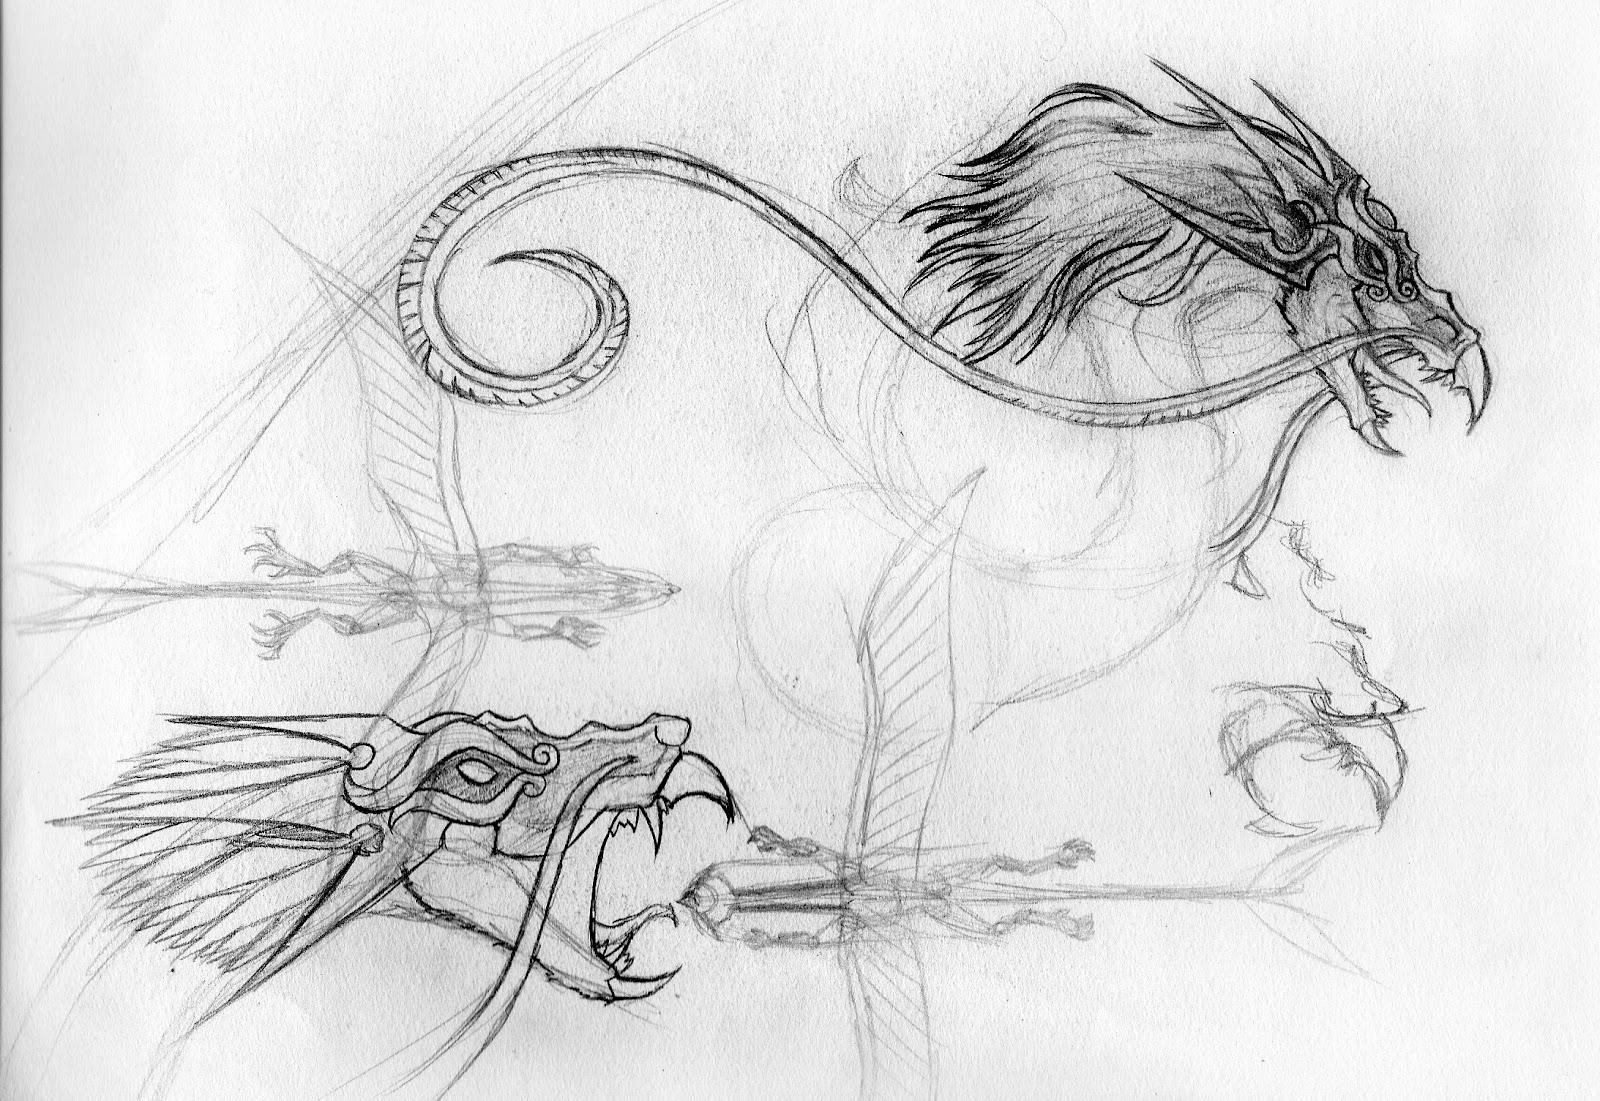 Joshua D. Altobelli's Art: Evil Wind Dragon Sketch